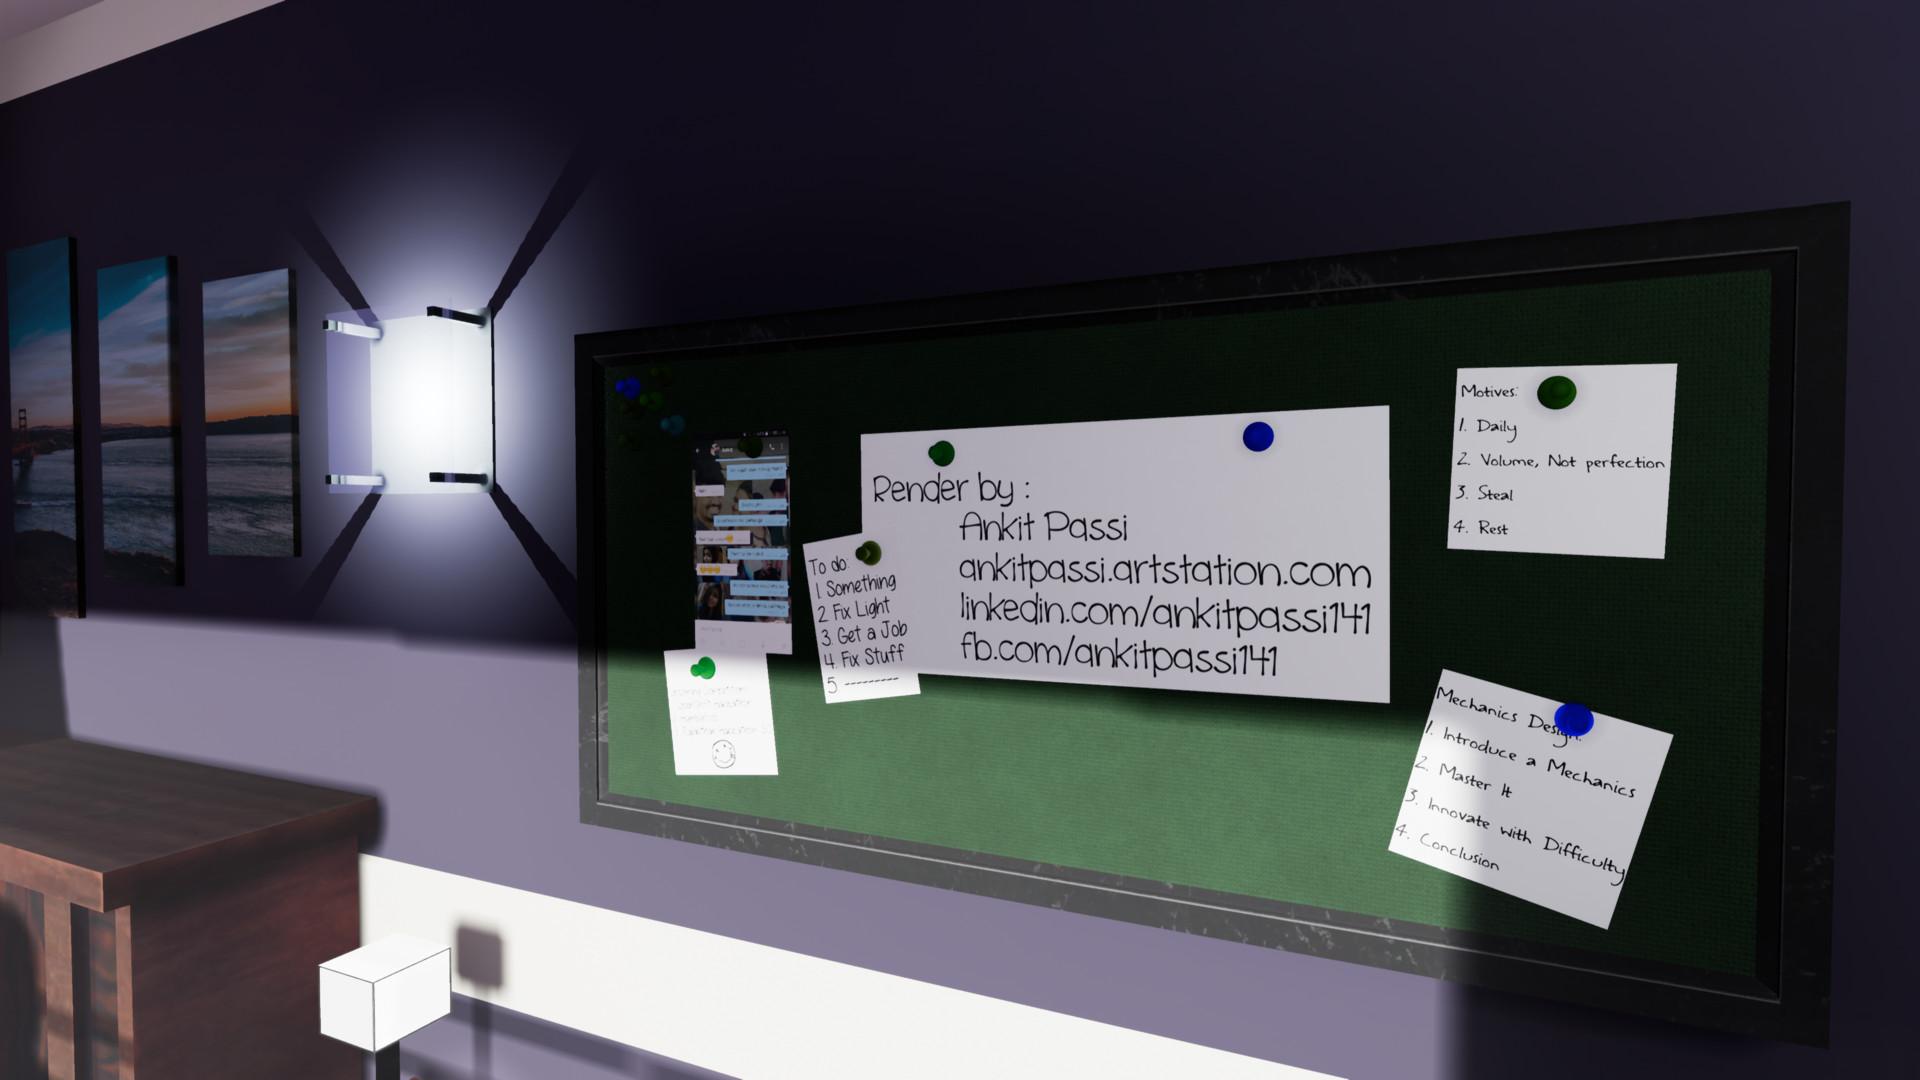 Realisitic Apartment Design using Unreal Engine 4